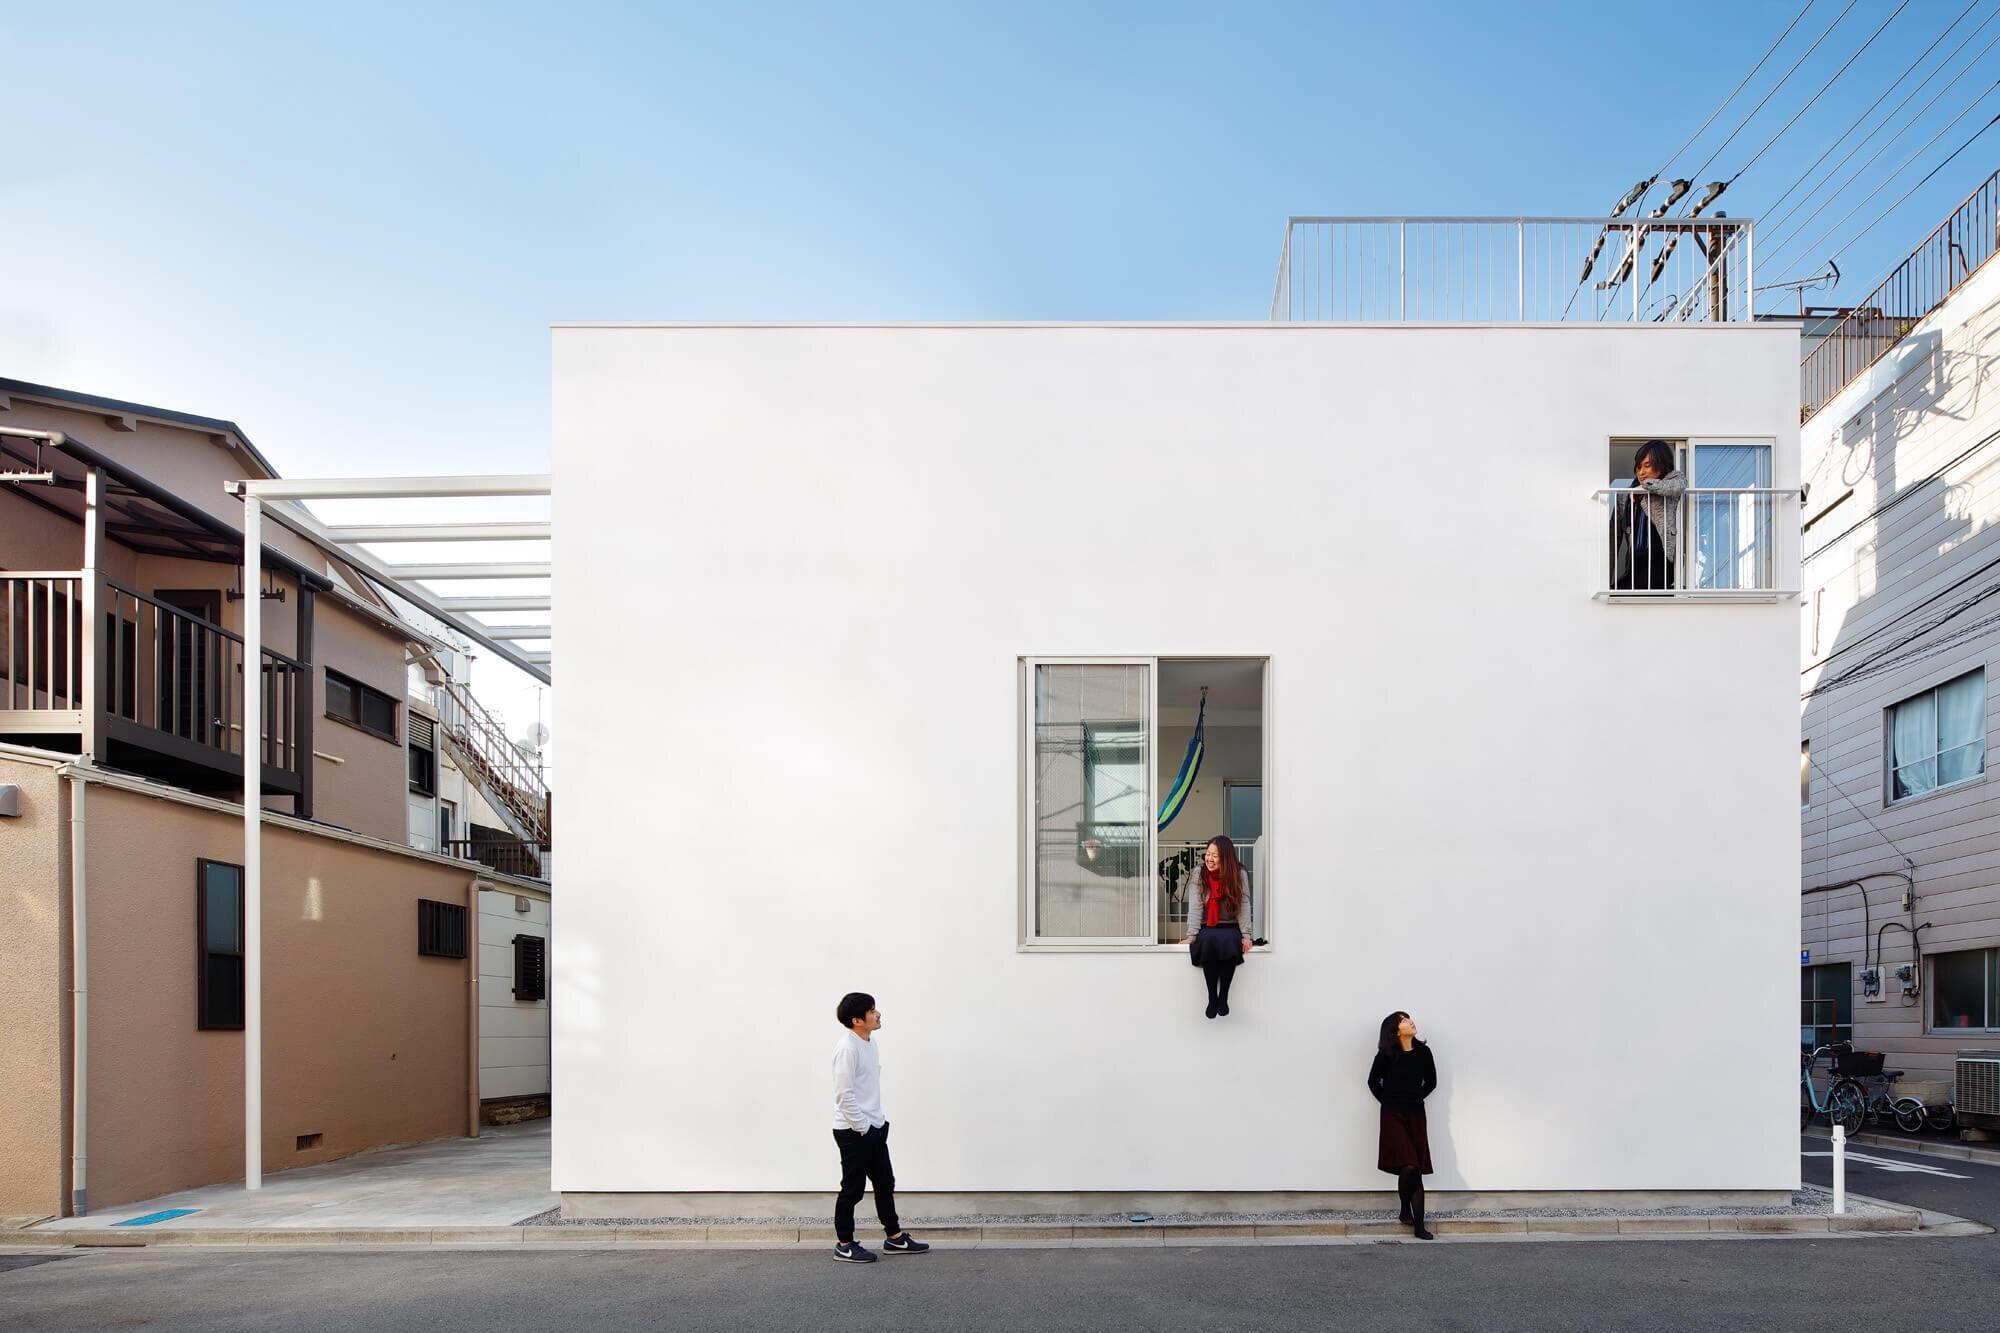 Balcony-House-Takeshi-Hosaka-Architects-Japan-8